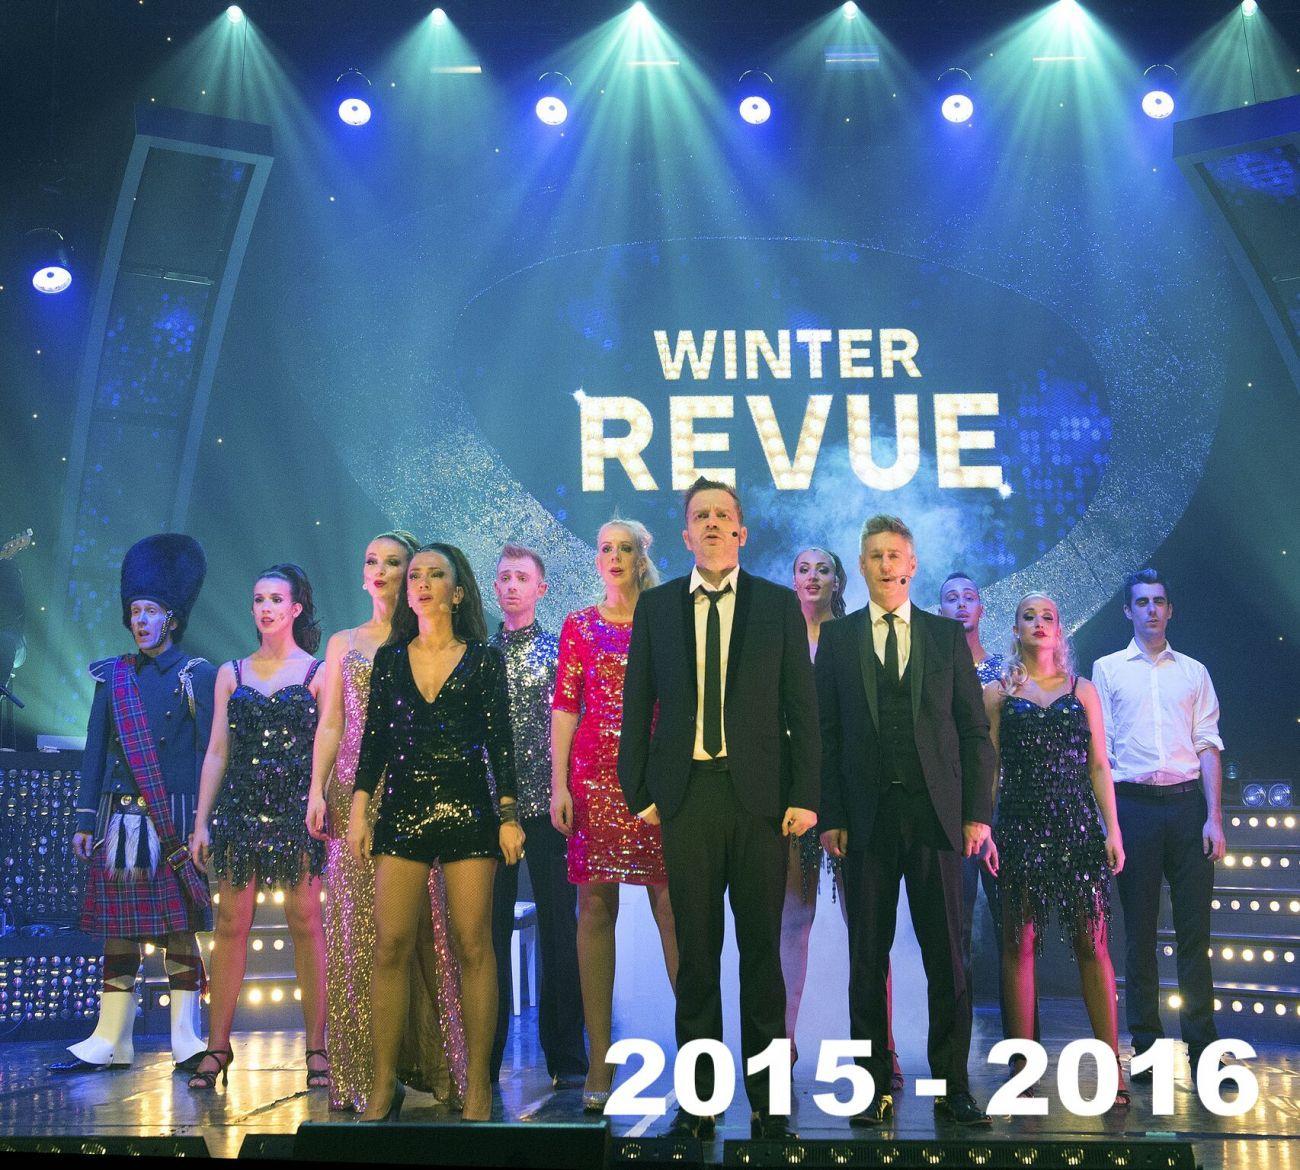 Winterrevue 2015 - 2016